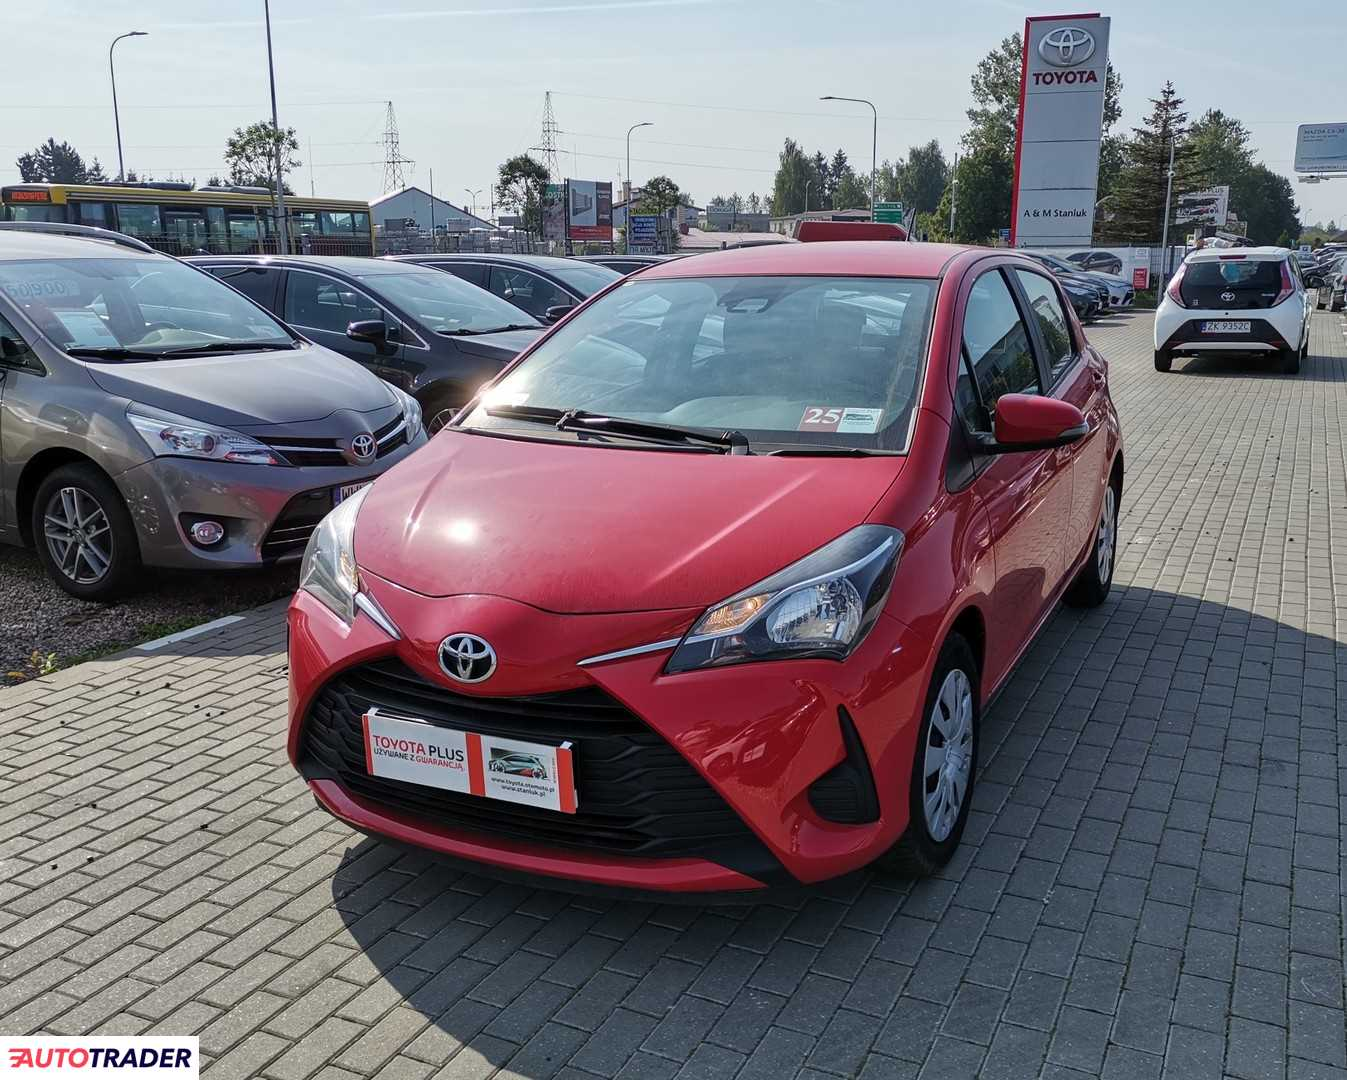 Toyota Yaris 2018 1.0 69 KM